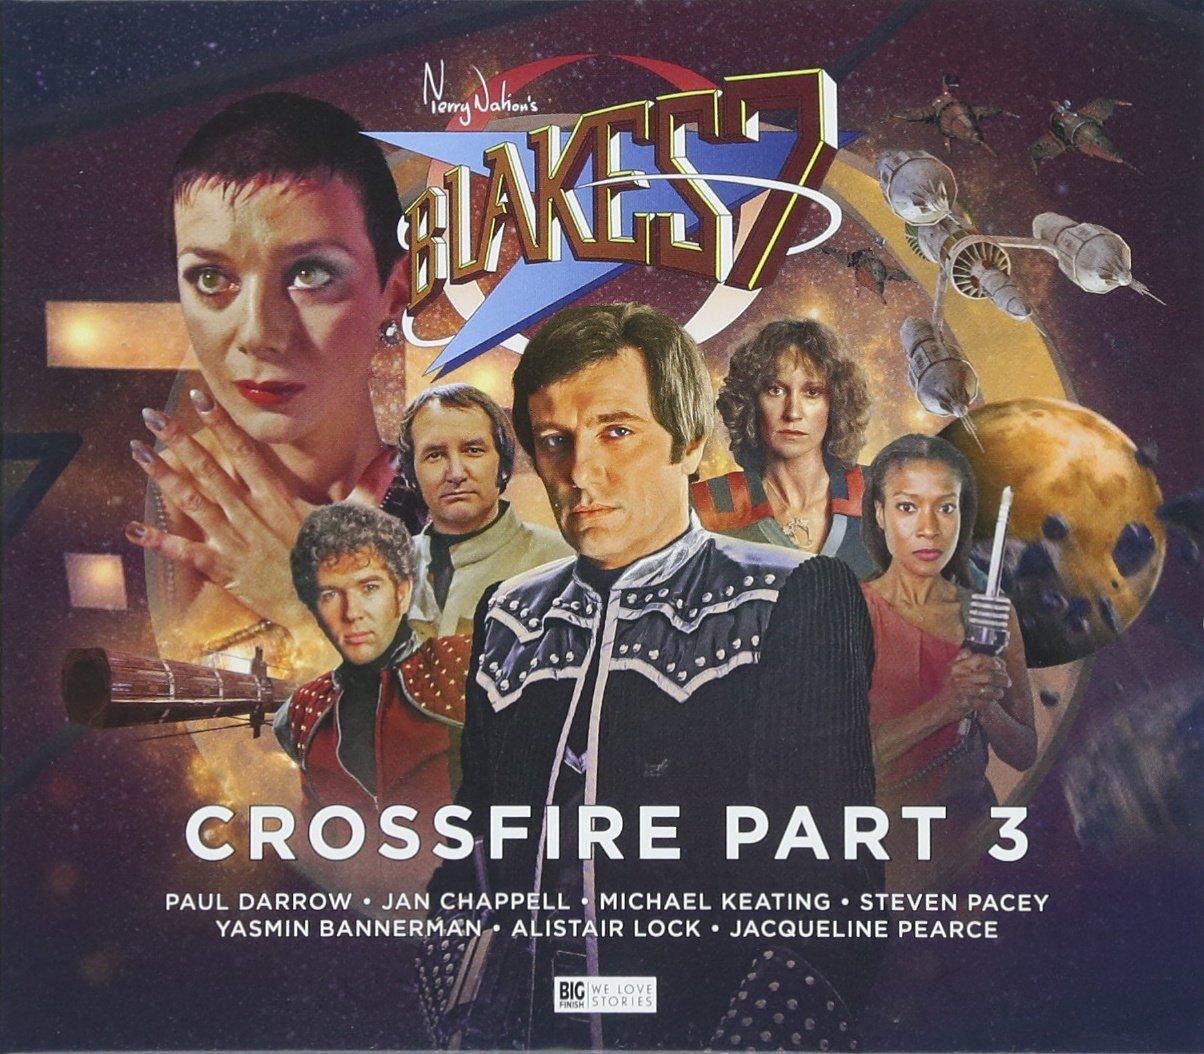 Blake's 7 - 4: Crossfire Part 3 ebook